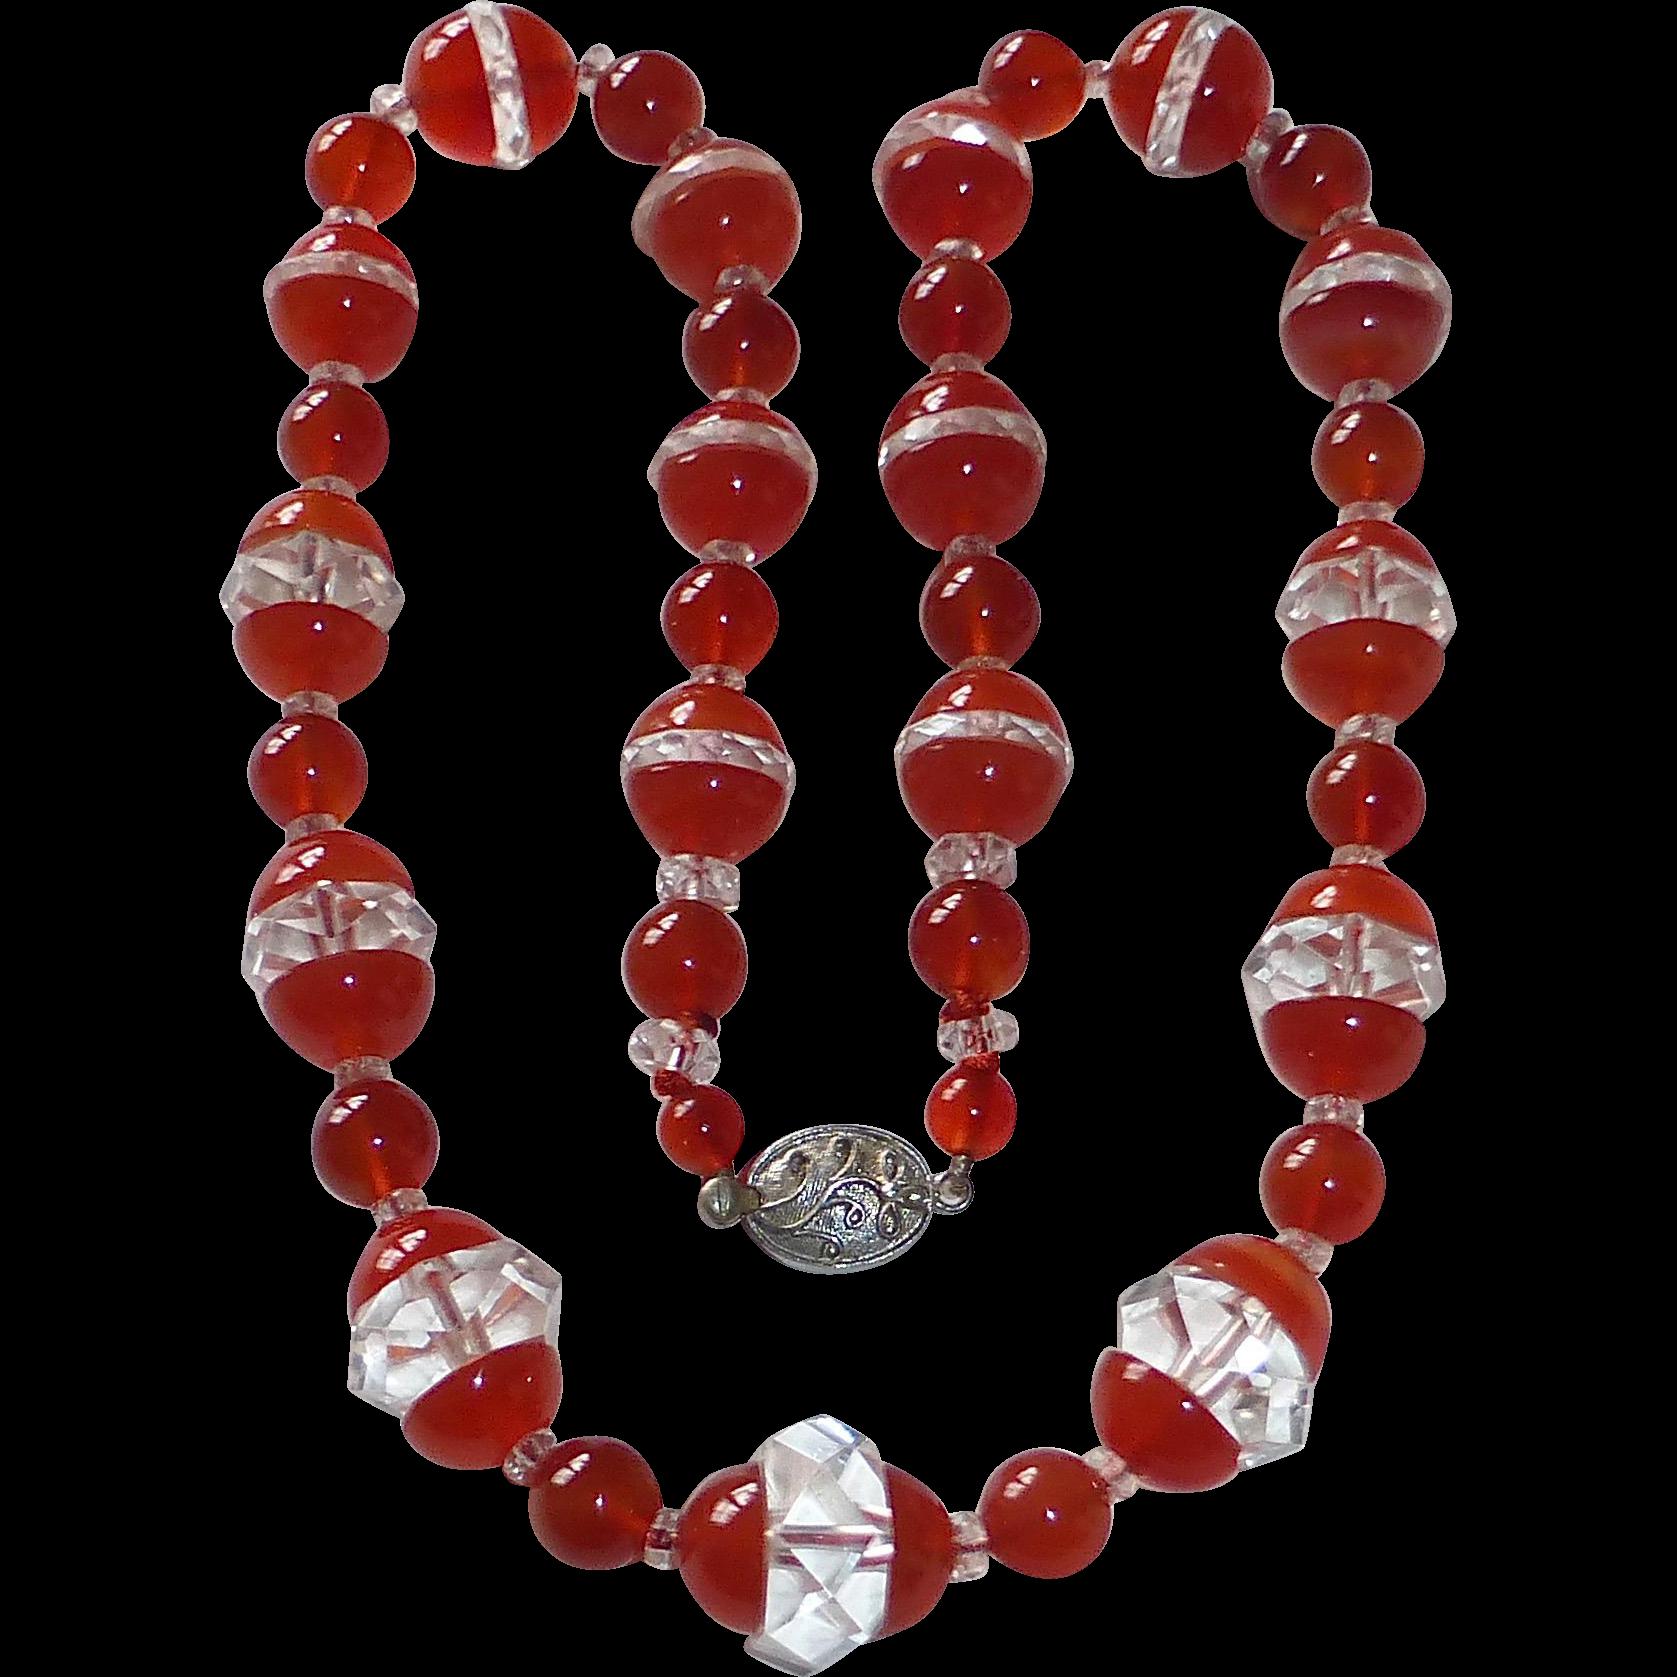 Art Deco Carnelian & Quartz Crystal Bead Necklace